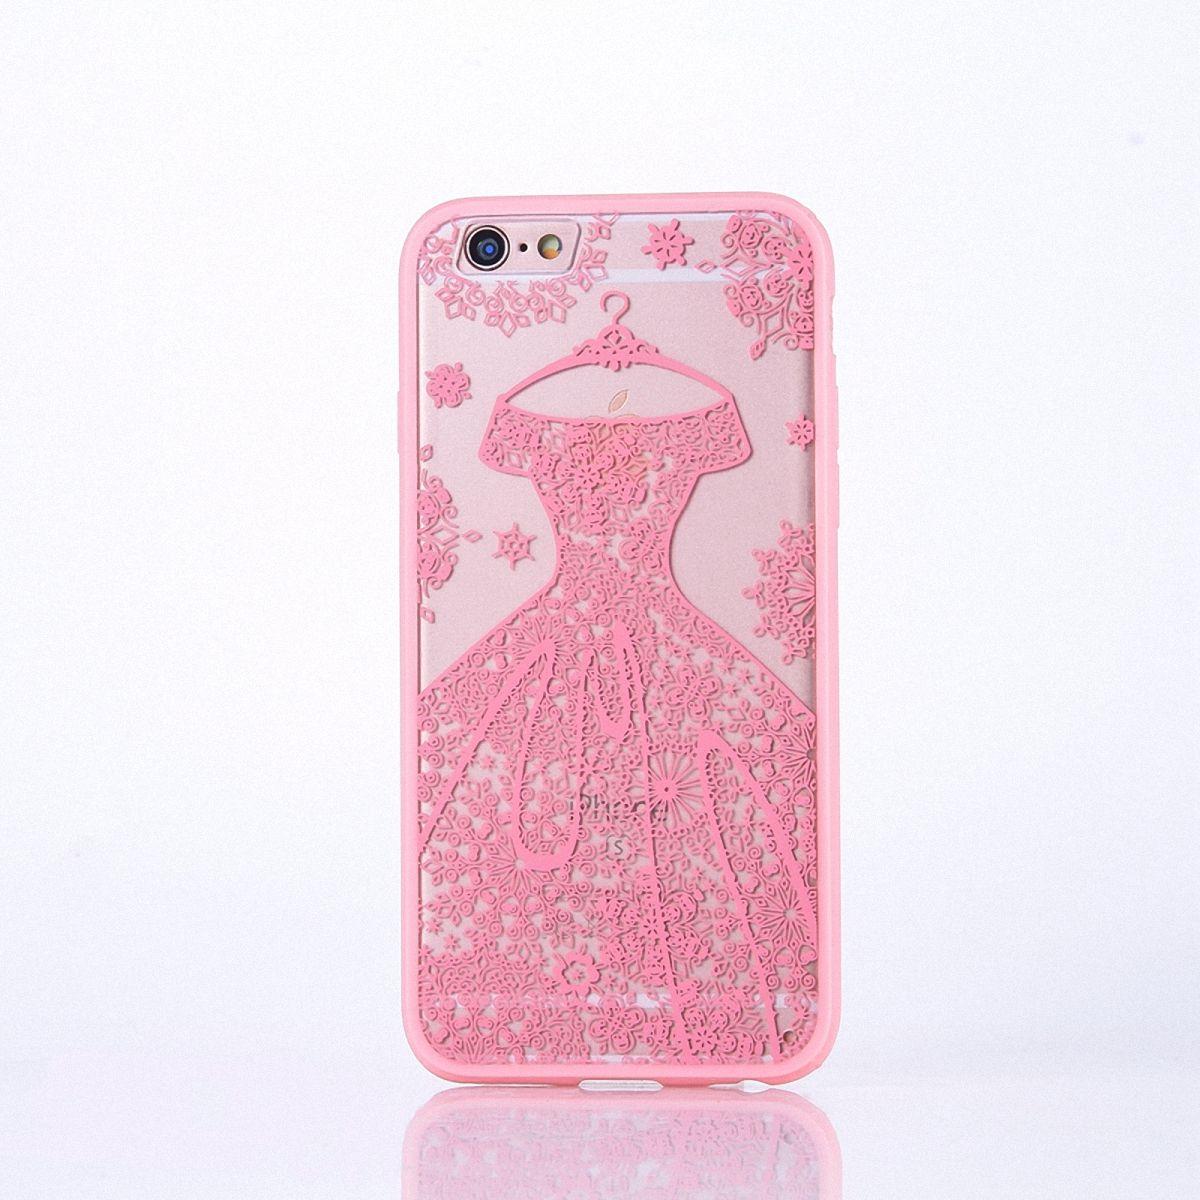 Handy Hülle Mandala für Apple iPhone 8 Design Case Schutzhülle Motiv Kleid Cover Tasche Bumper Rosa